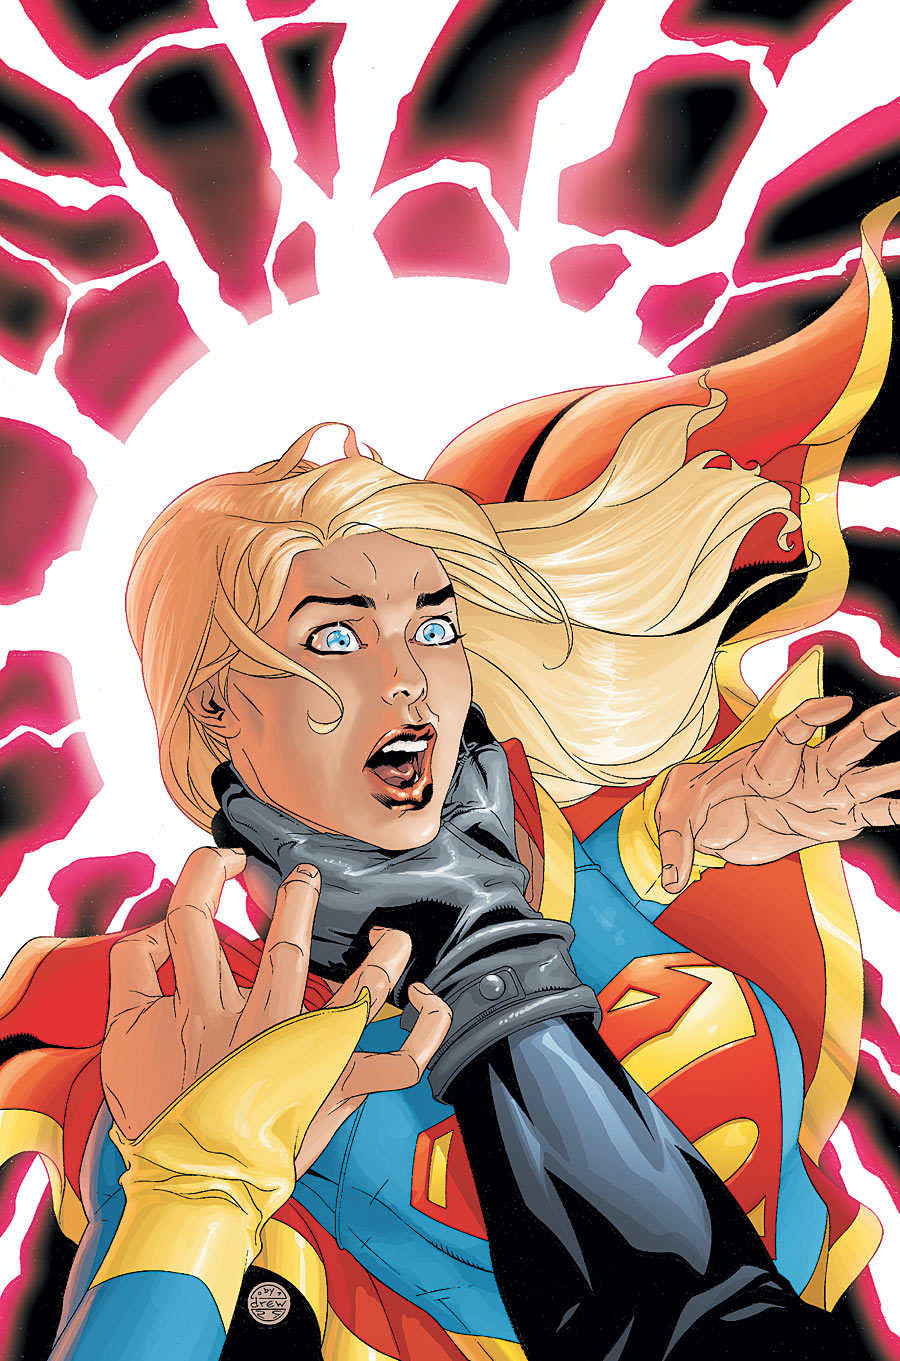 Supergirl Vol 5 26 Textless.jpg